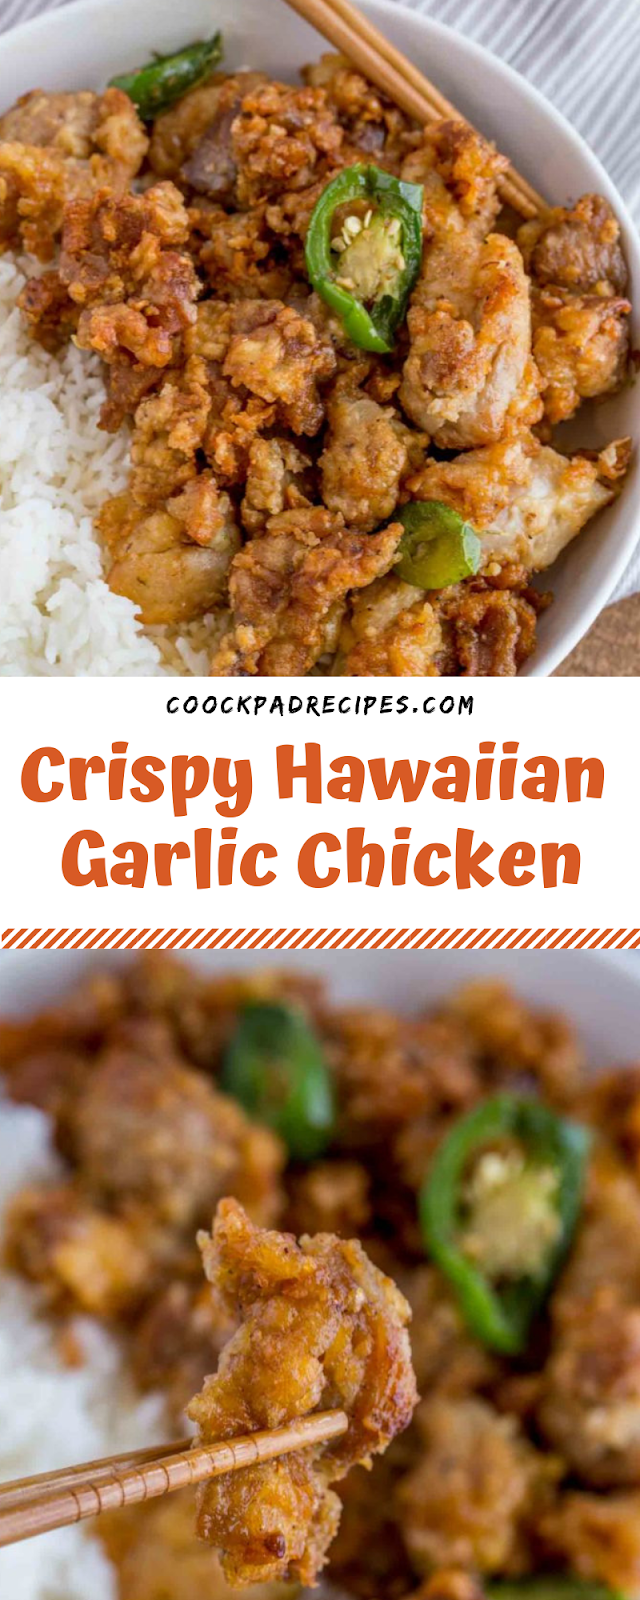 Crispy Hawaiian Garlic Chicken -